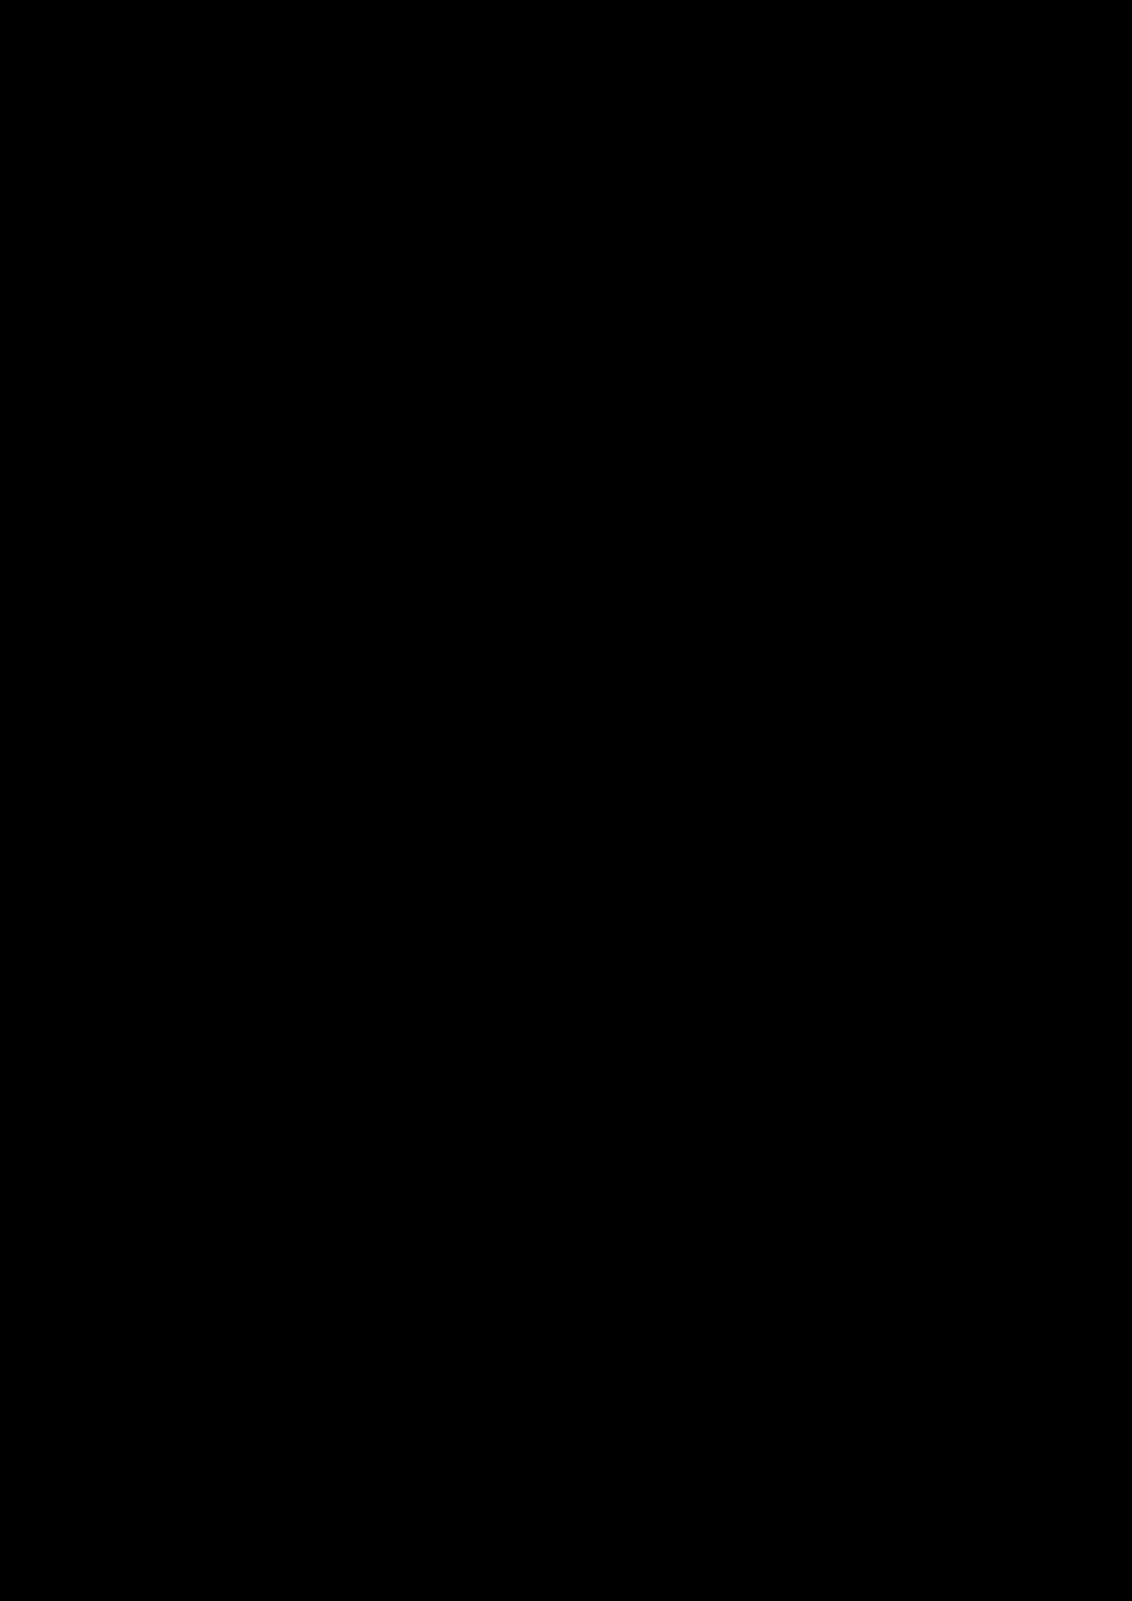 Ten lyubvi slide, Image 47